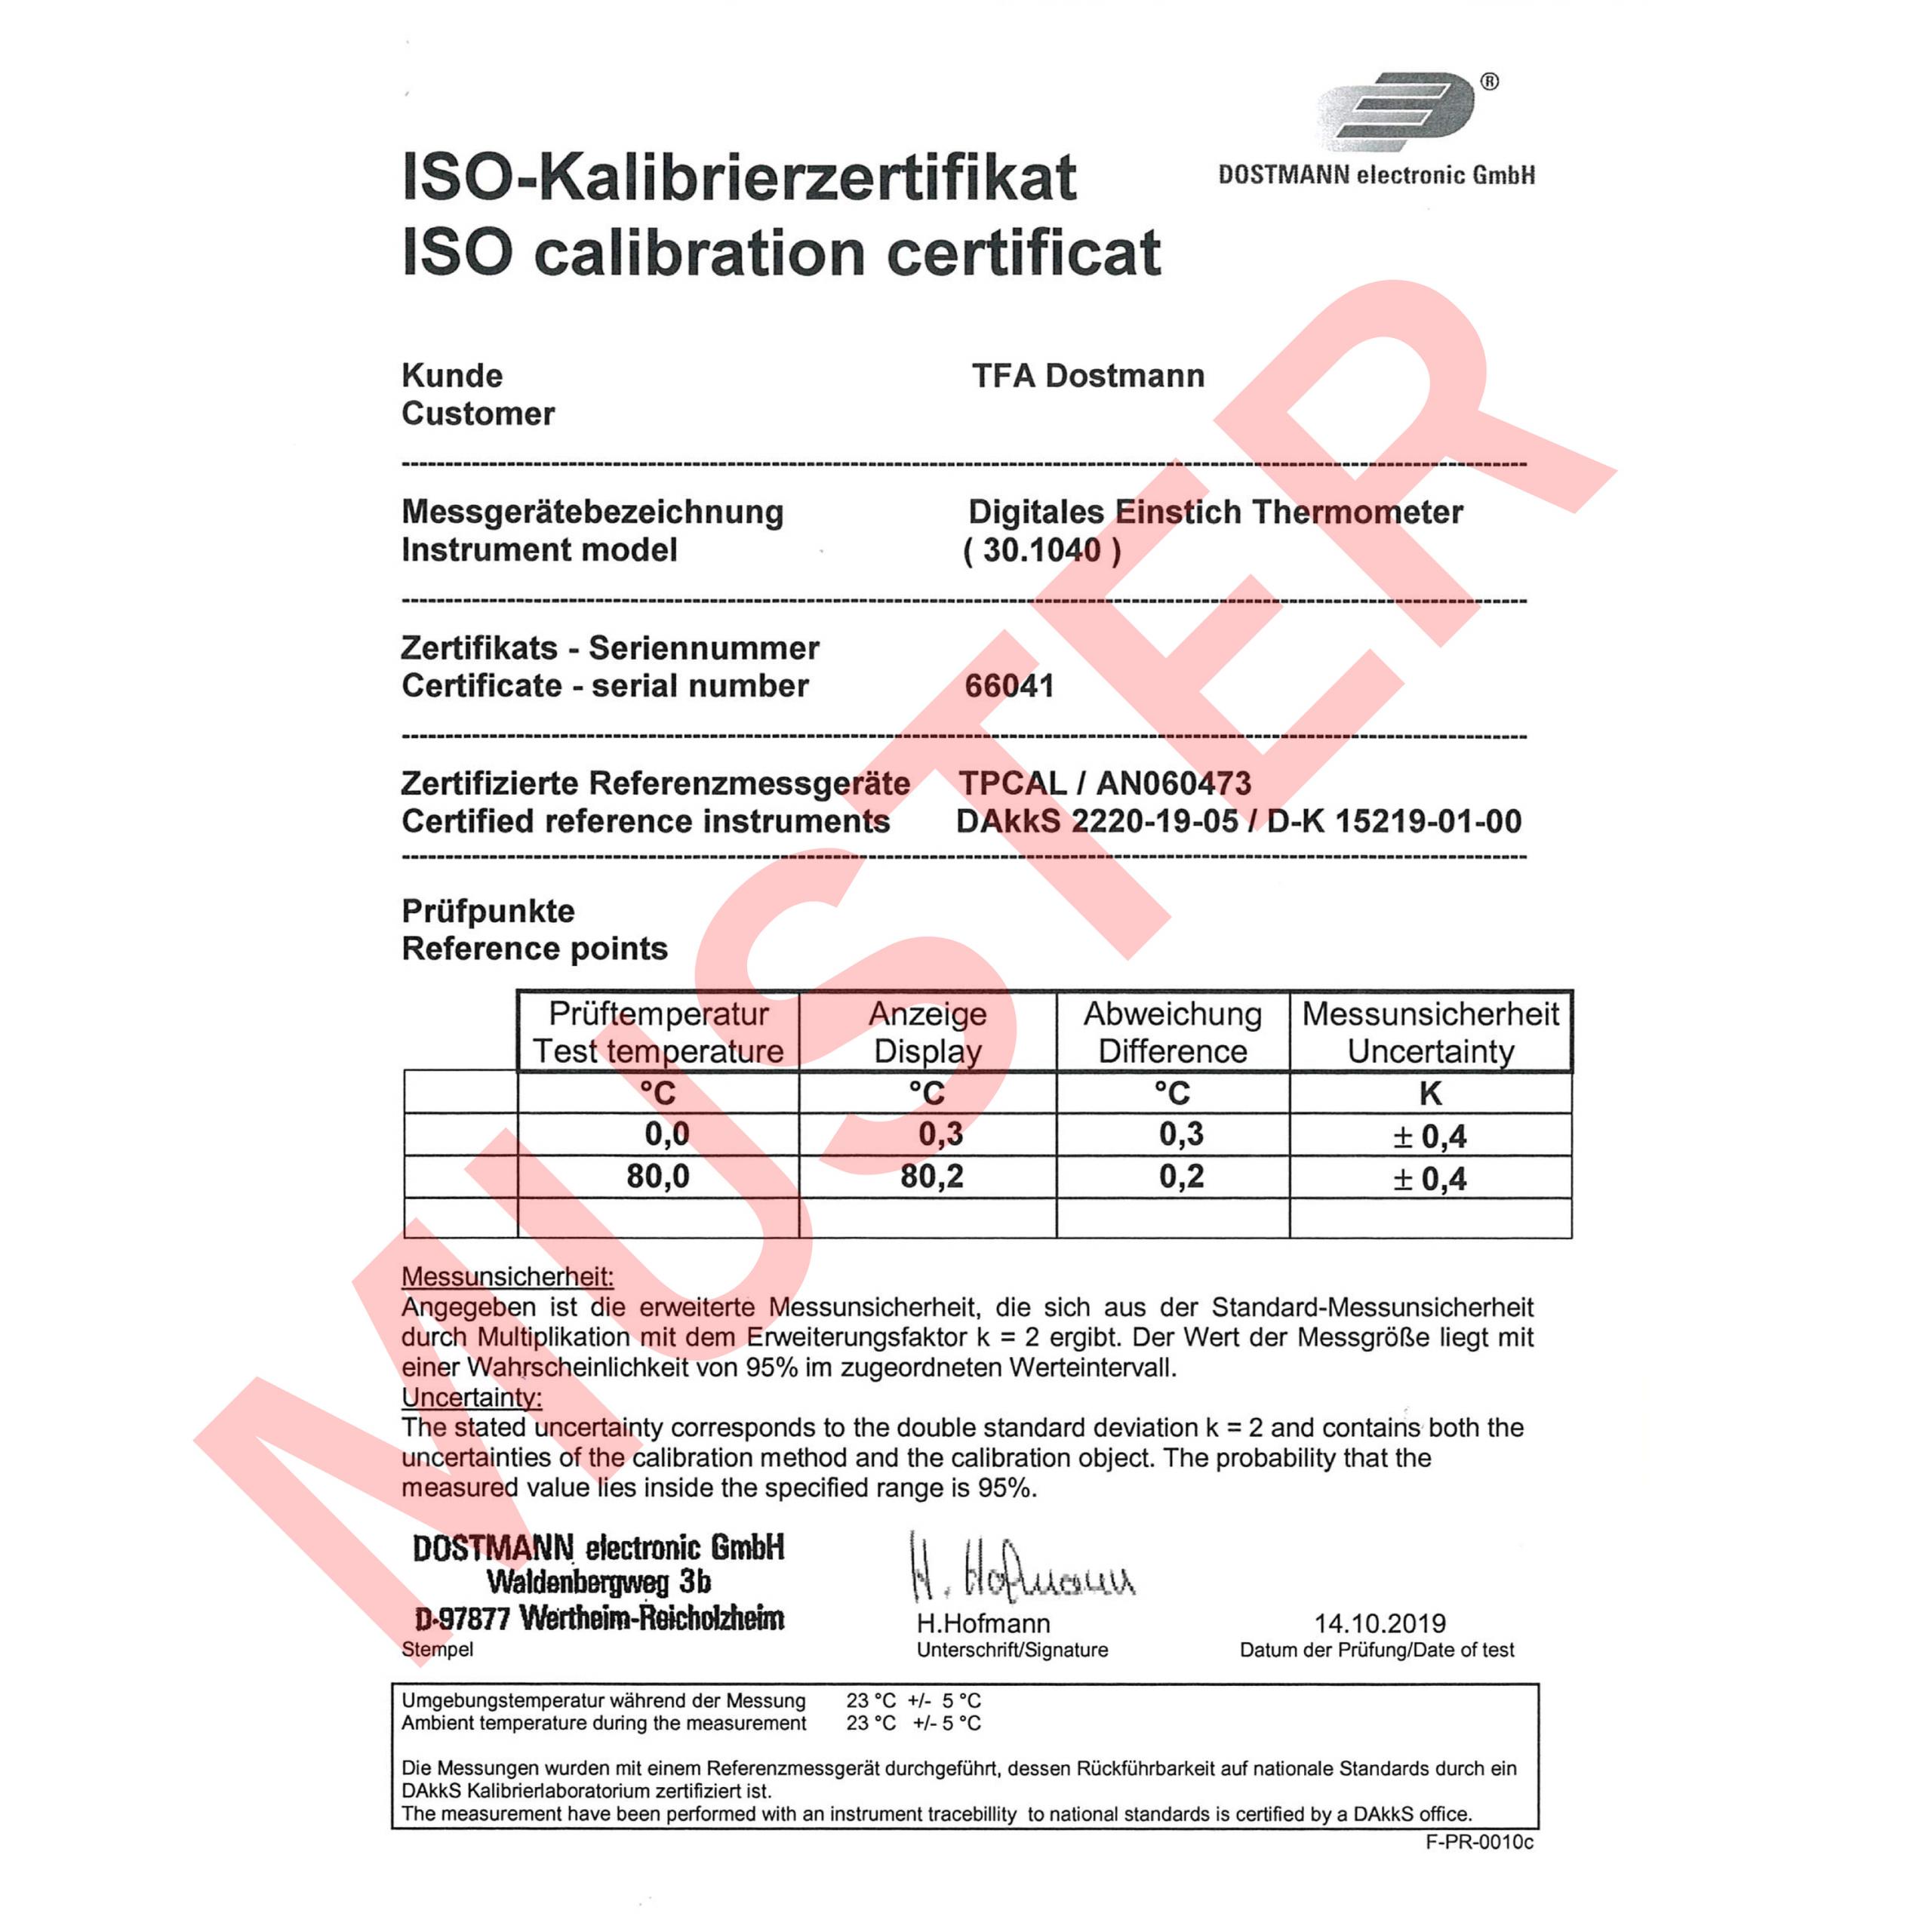 Zertifikat Muster Artikelnummer 301040.jpg